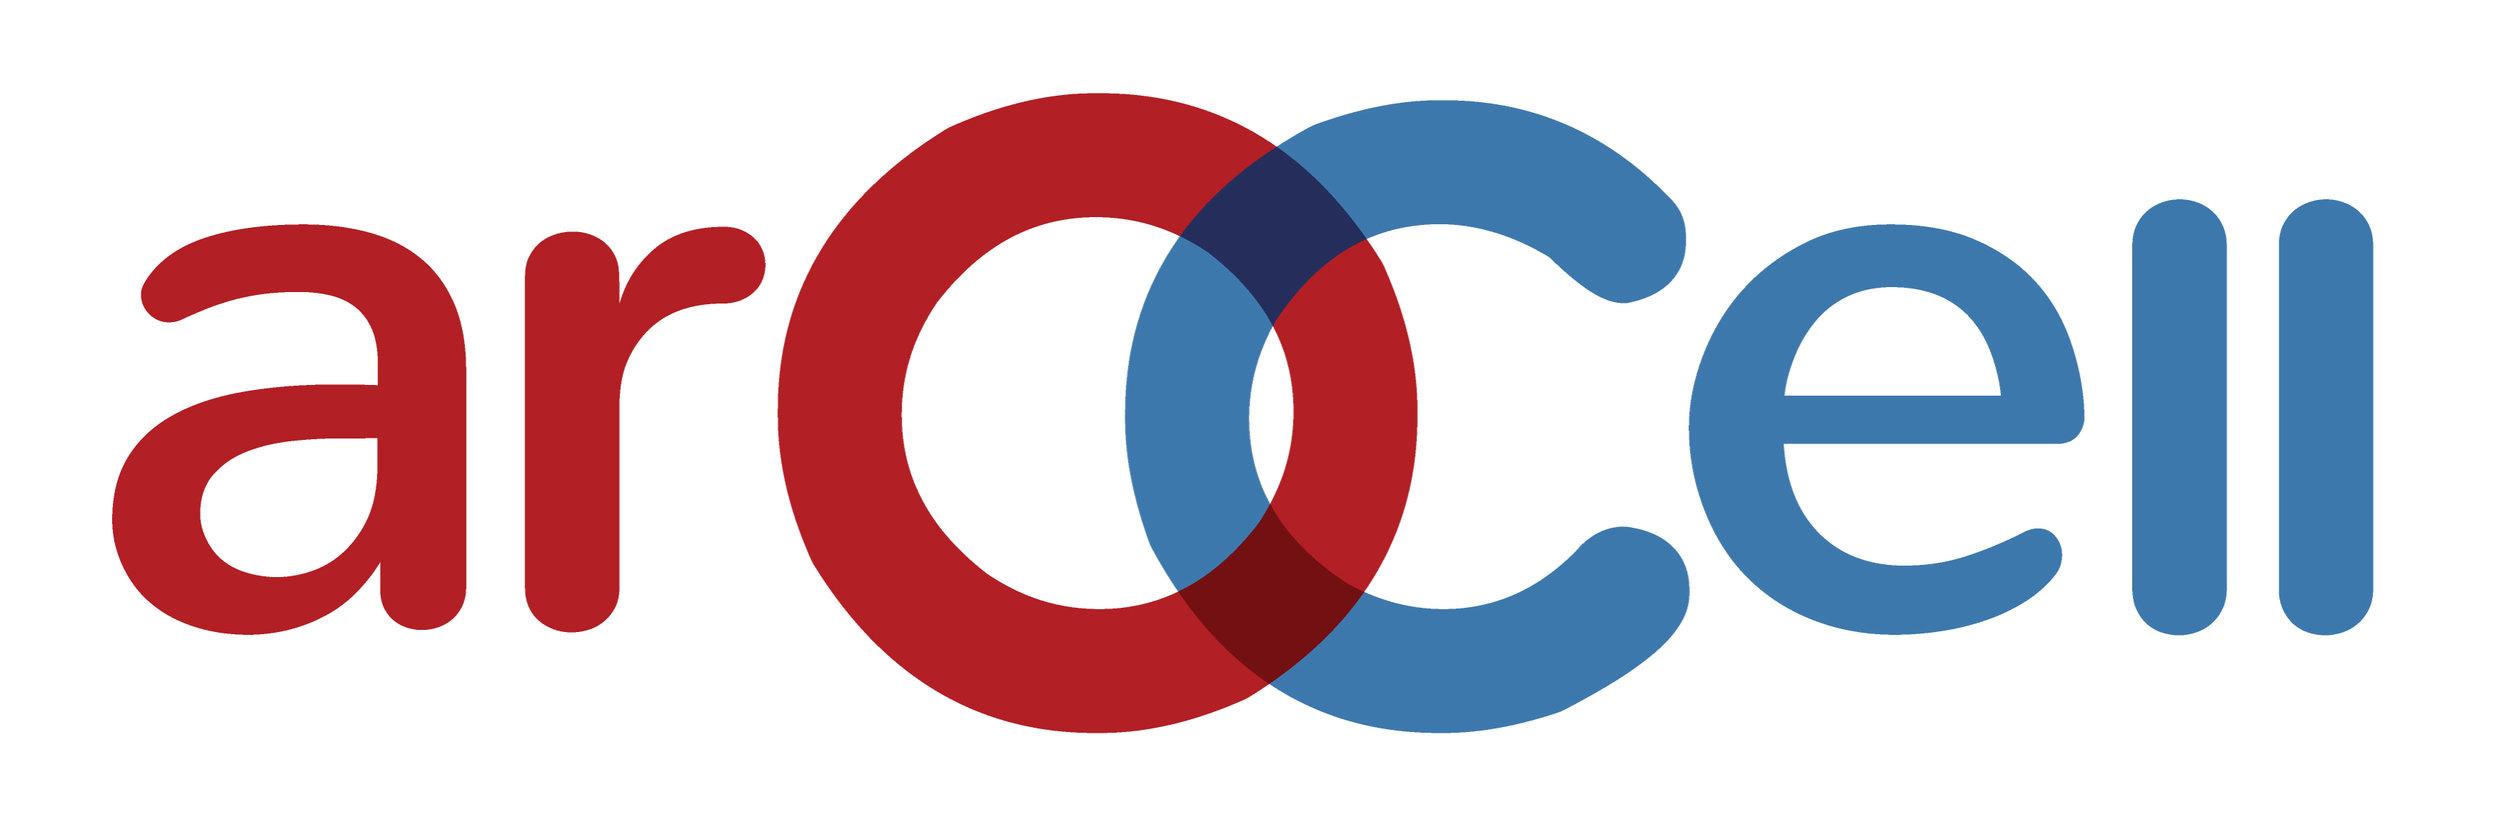 AroCell_logo-2.jpg